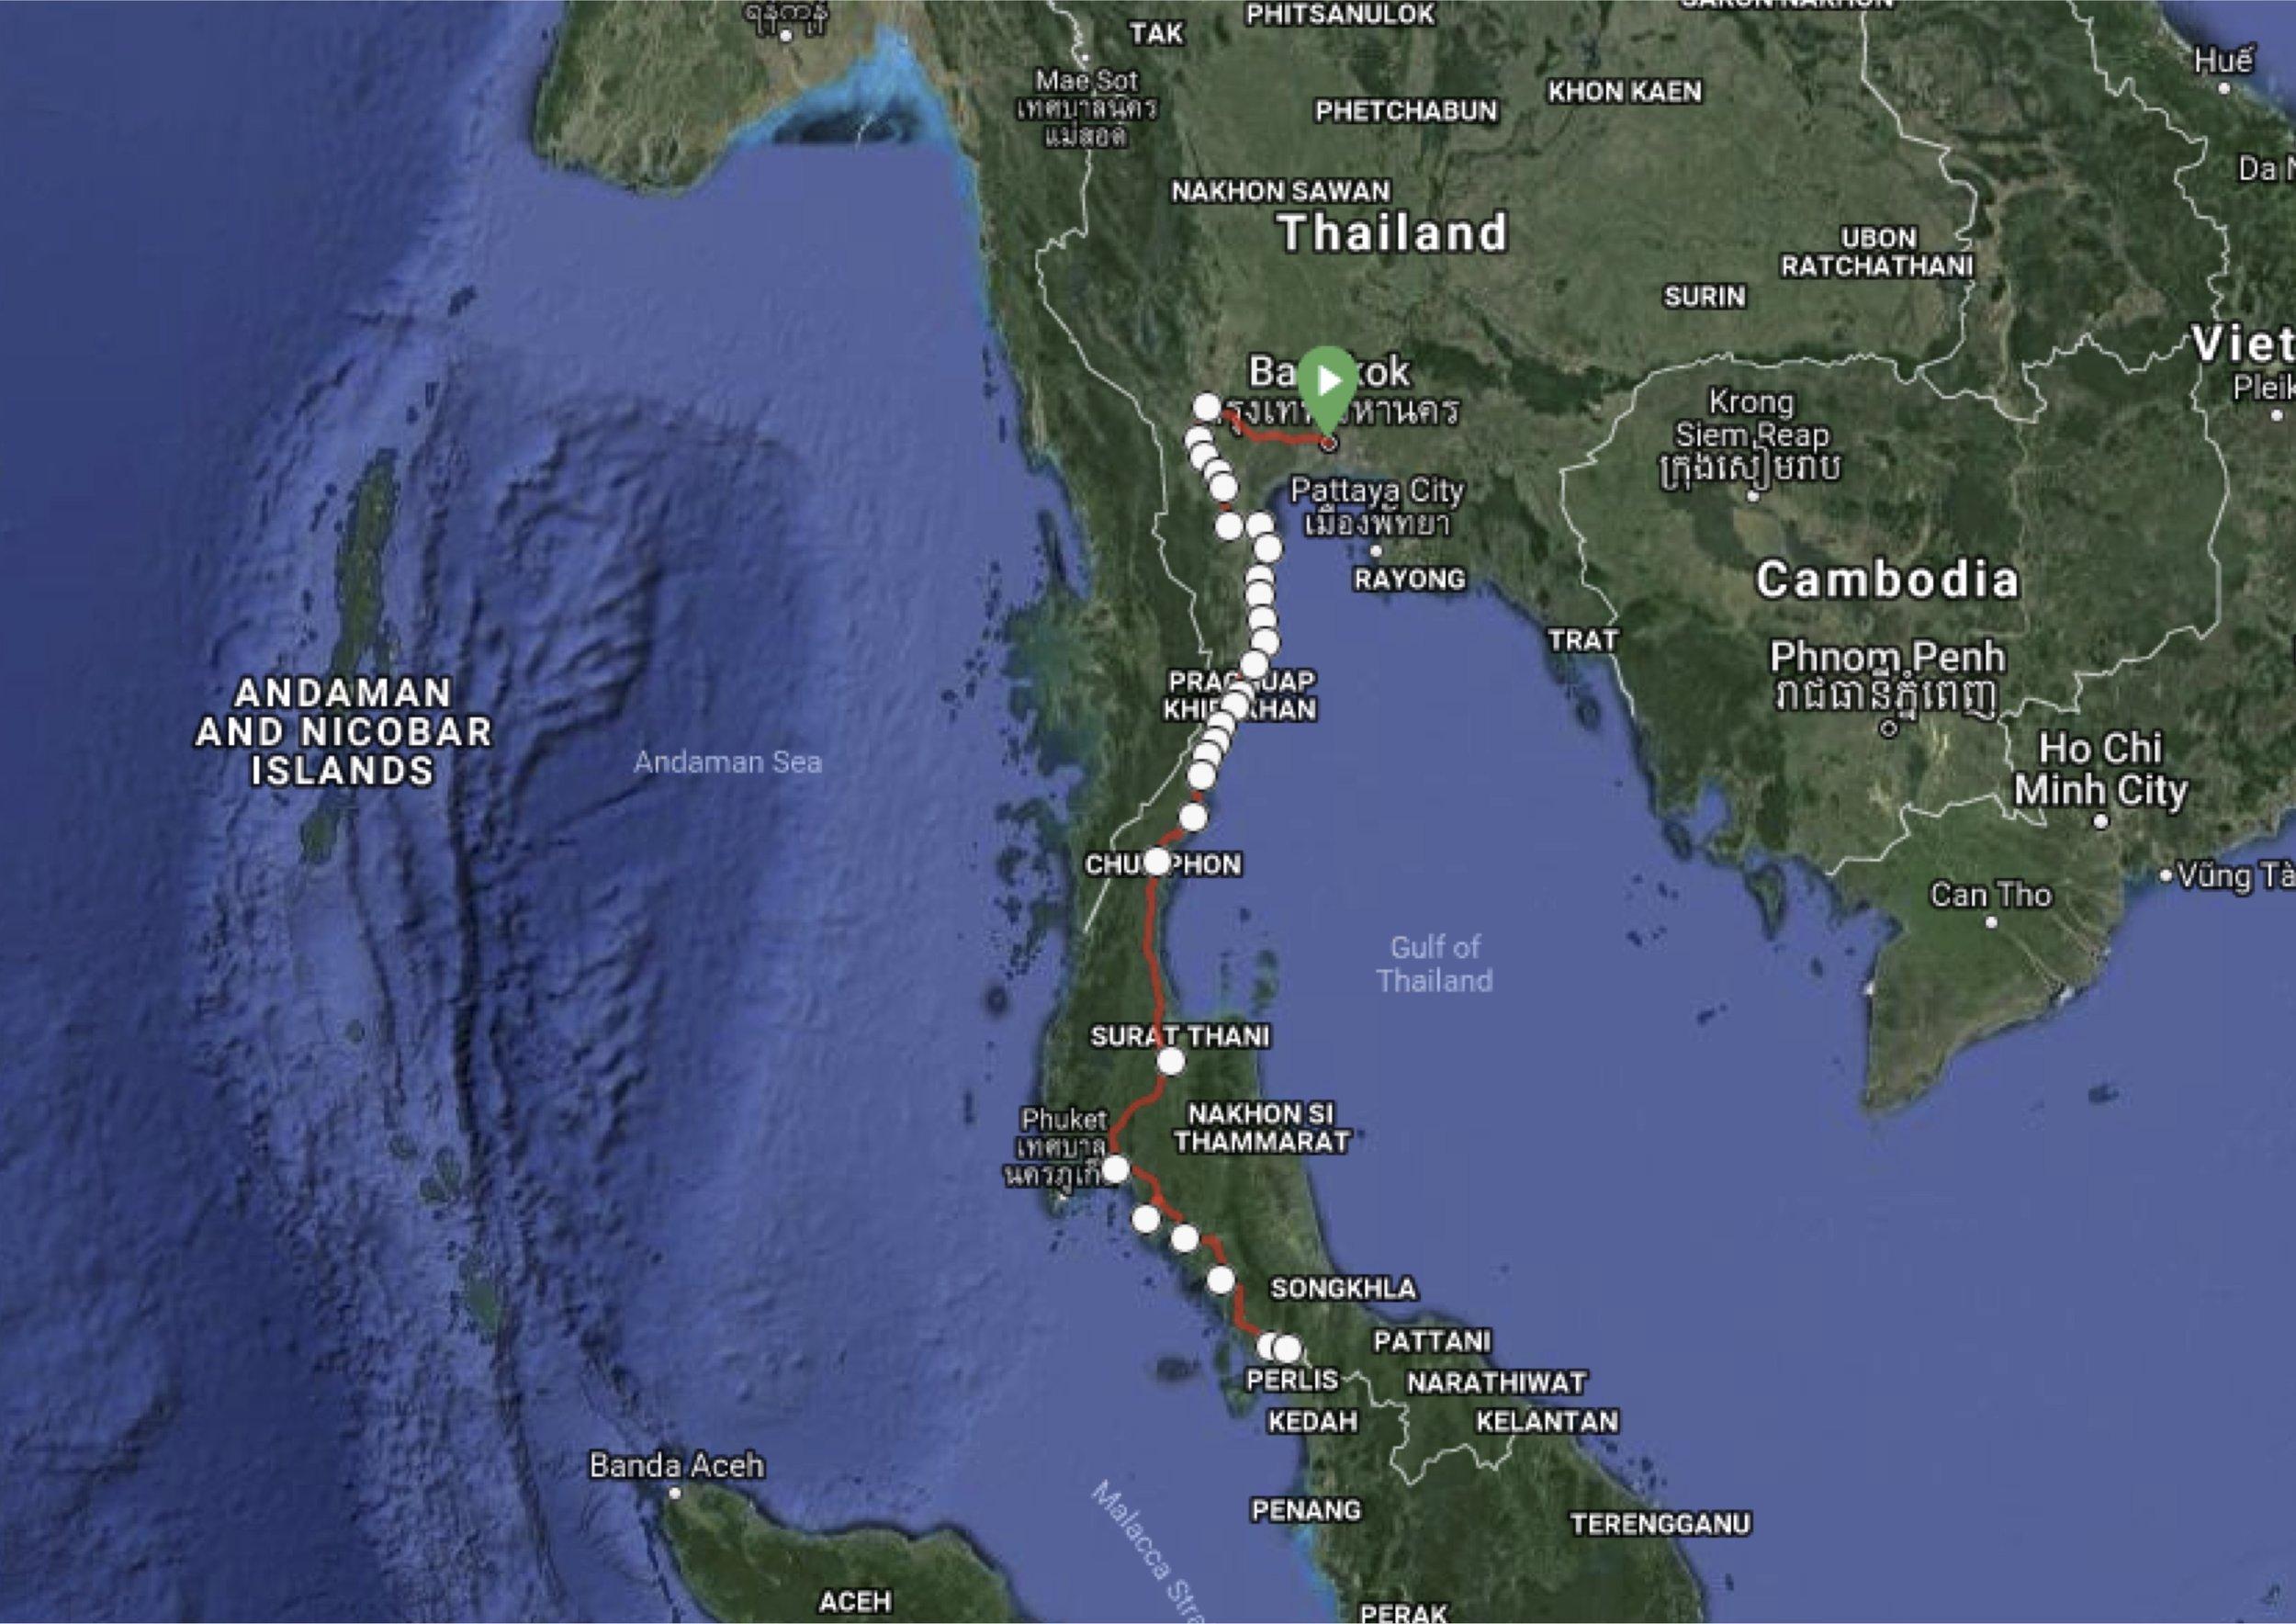 BKK - Southern Thailand.jpg